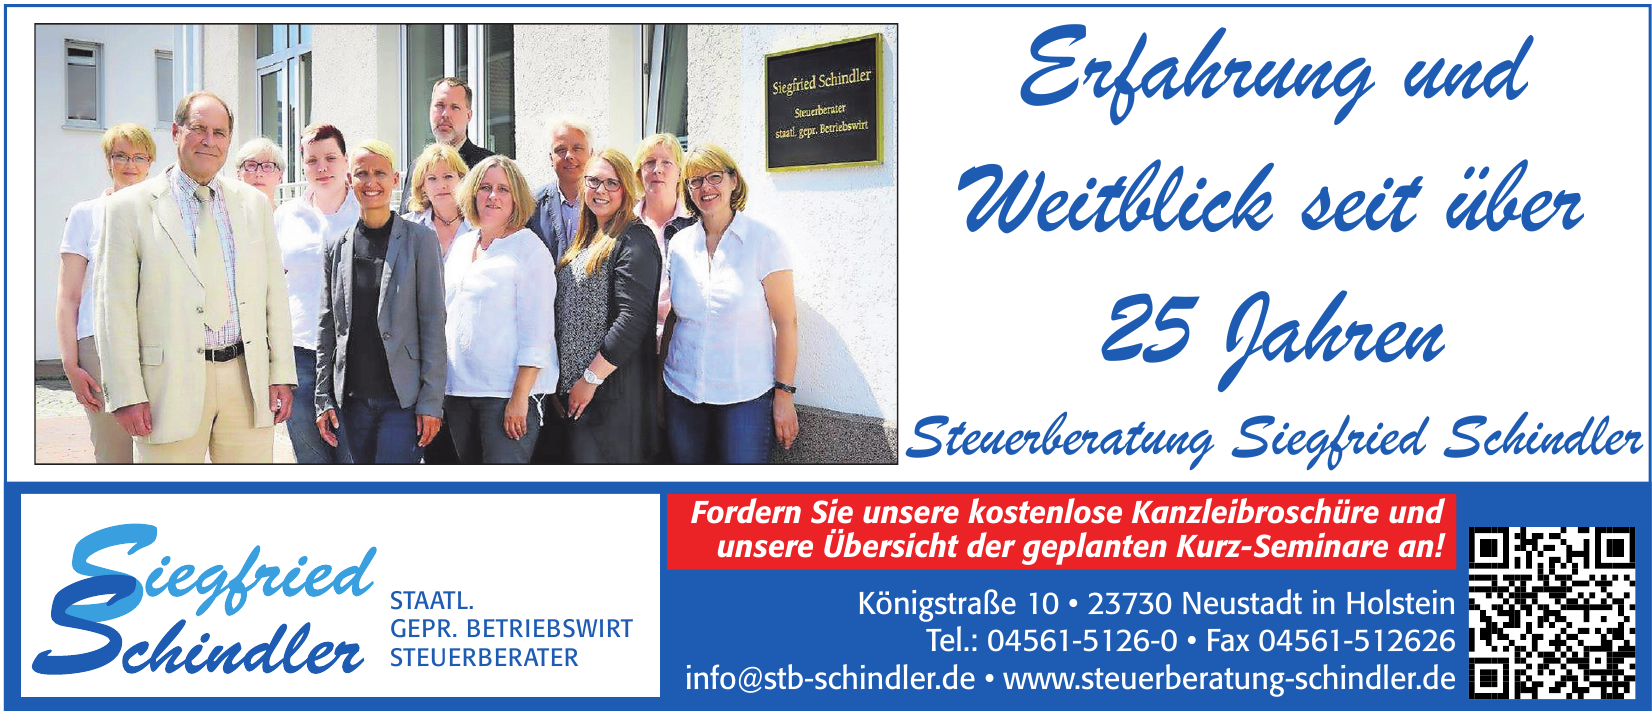 Steuerberatung Schindler